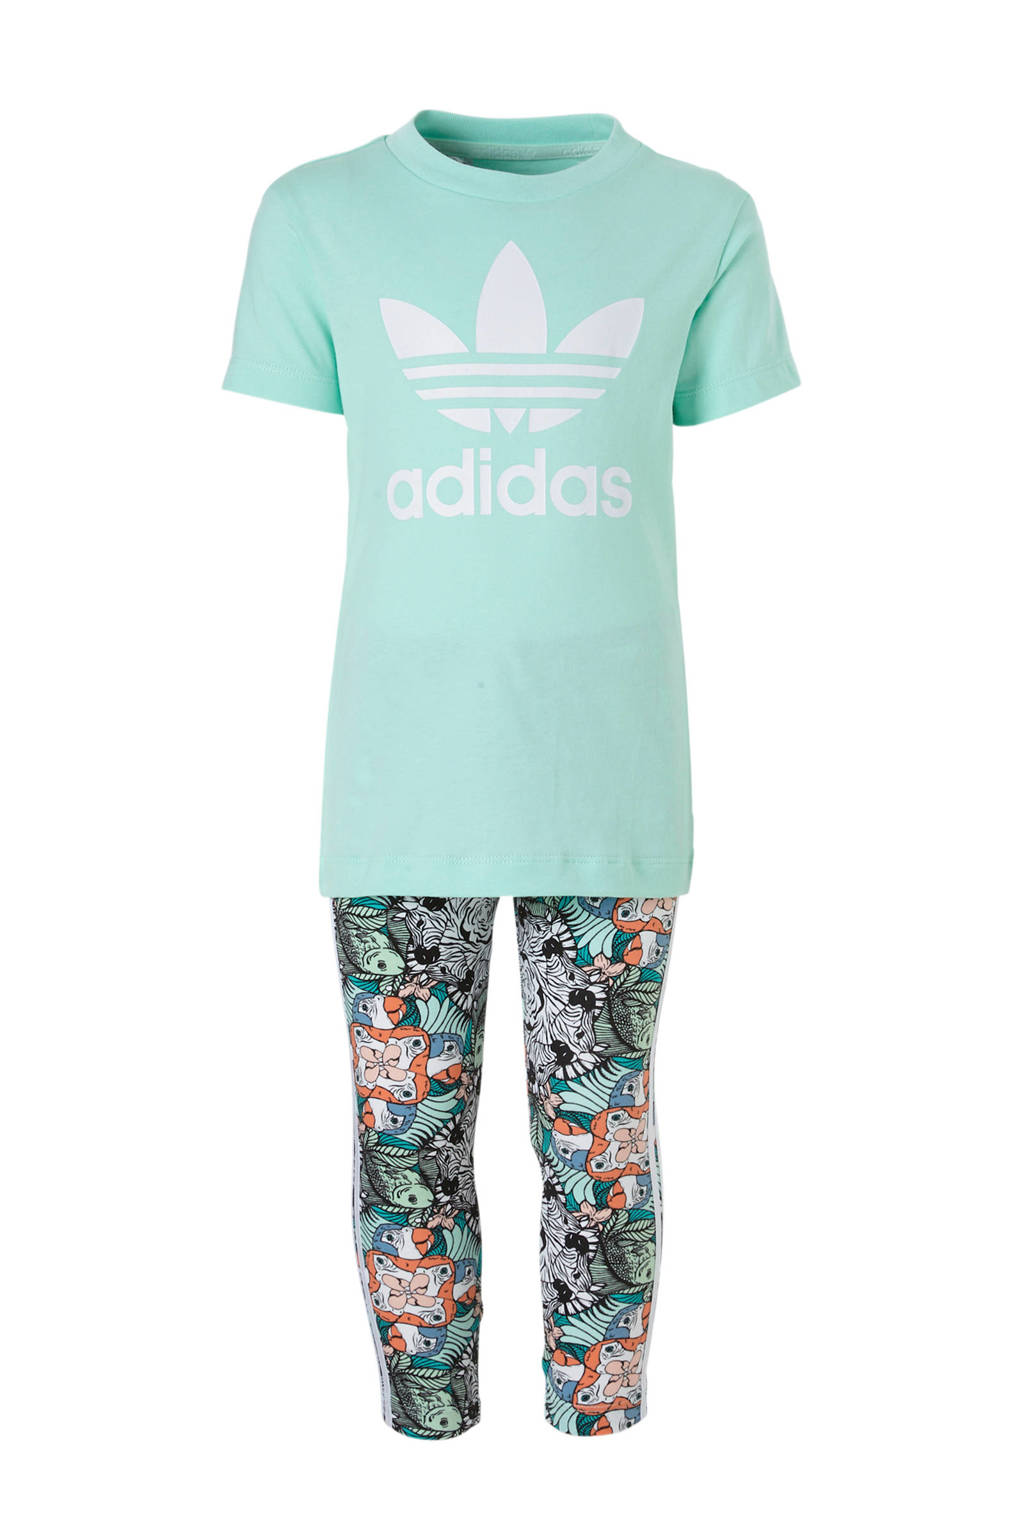 adidas originals T-shirt + legging mintgroen, Mintgroen